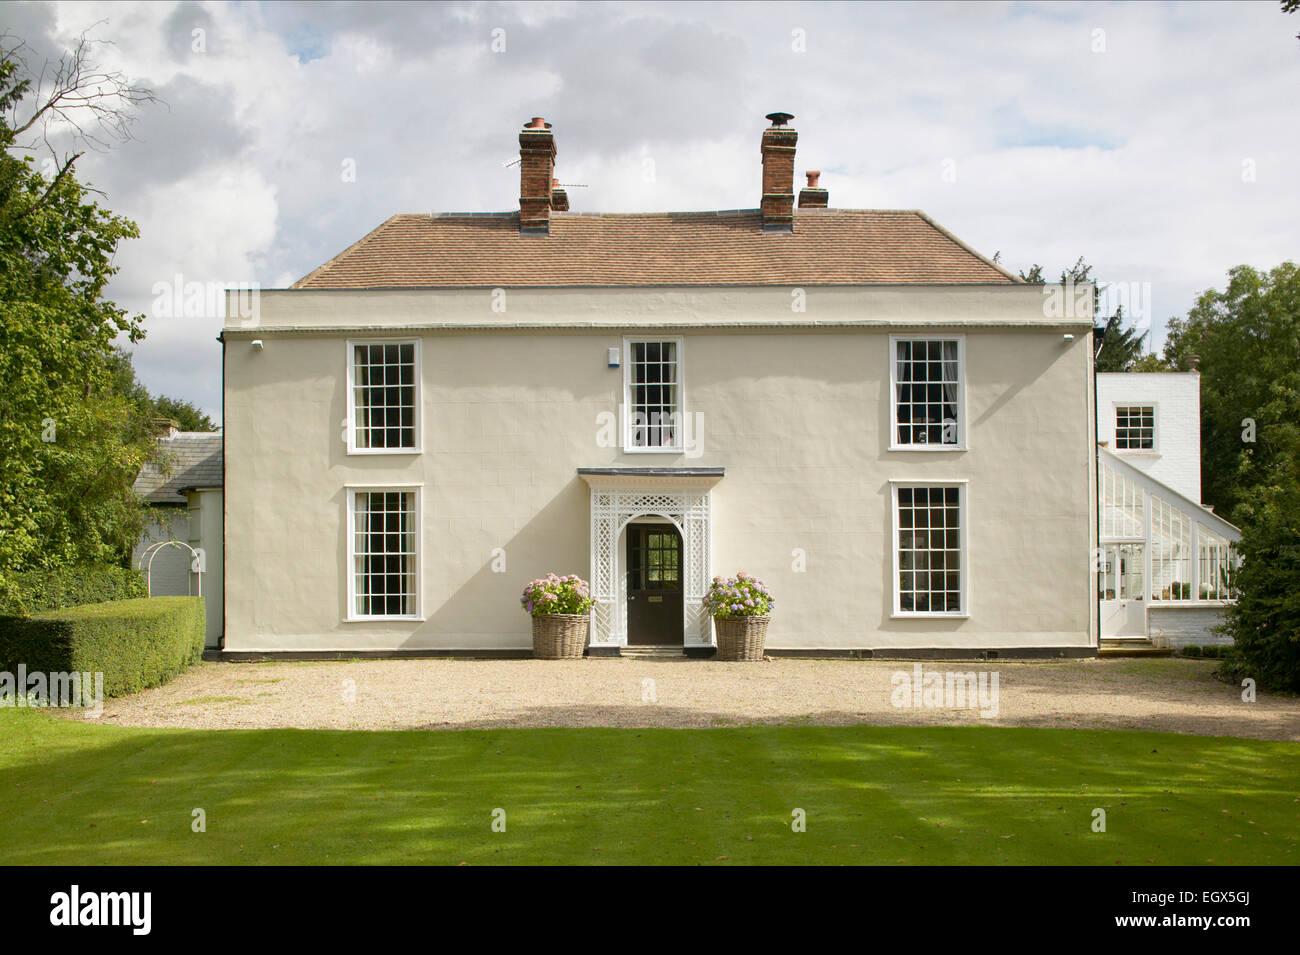 Phenomenal Front Exterior Of Georgian Country House Stock Photo Download Free Architecture Designs Scobabritishbridgeorg